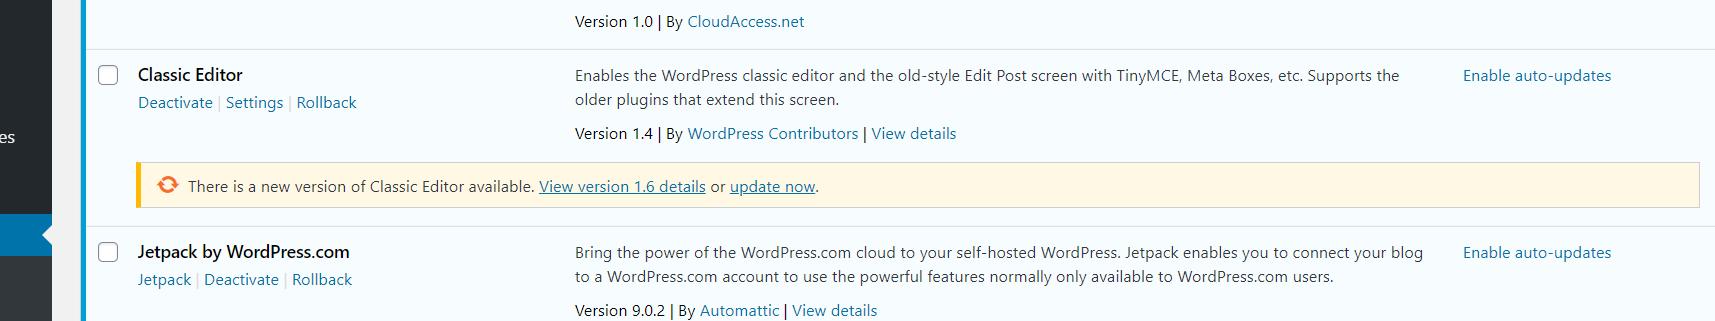 classic editor downgraded